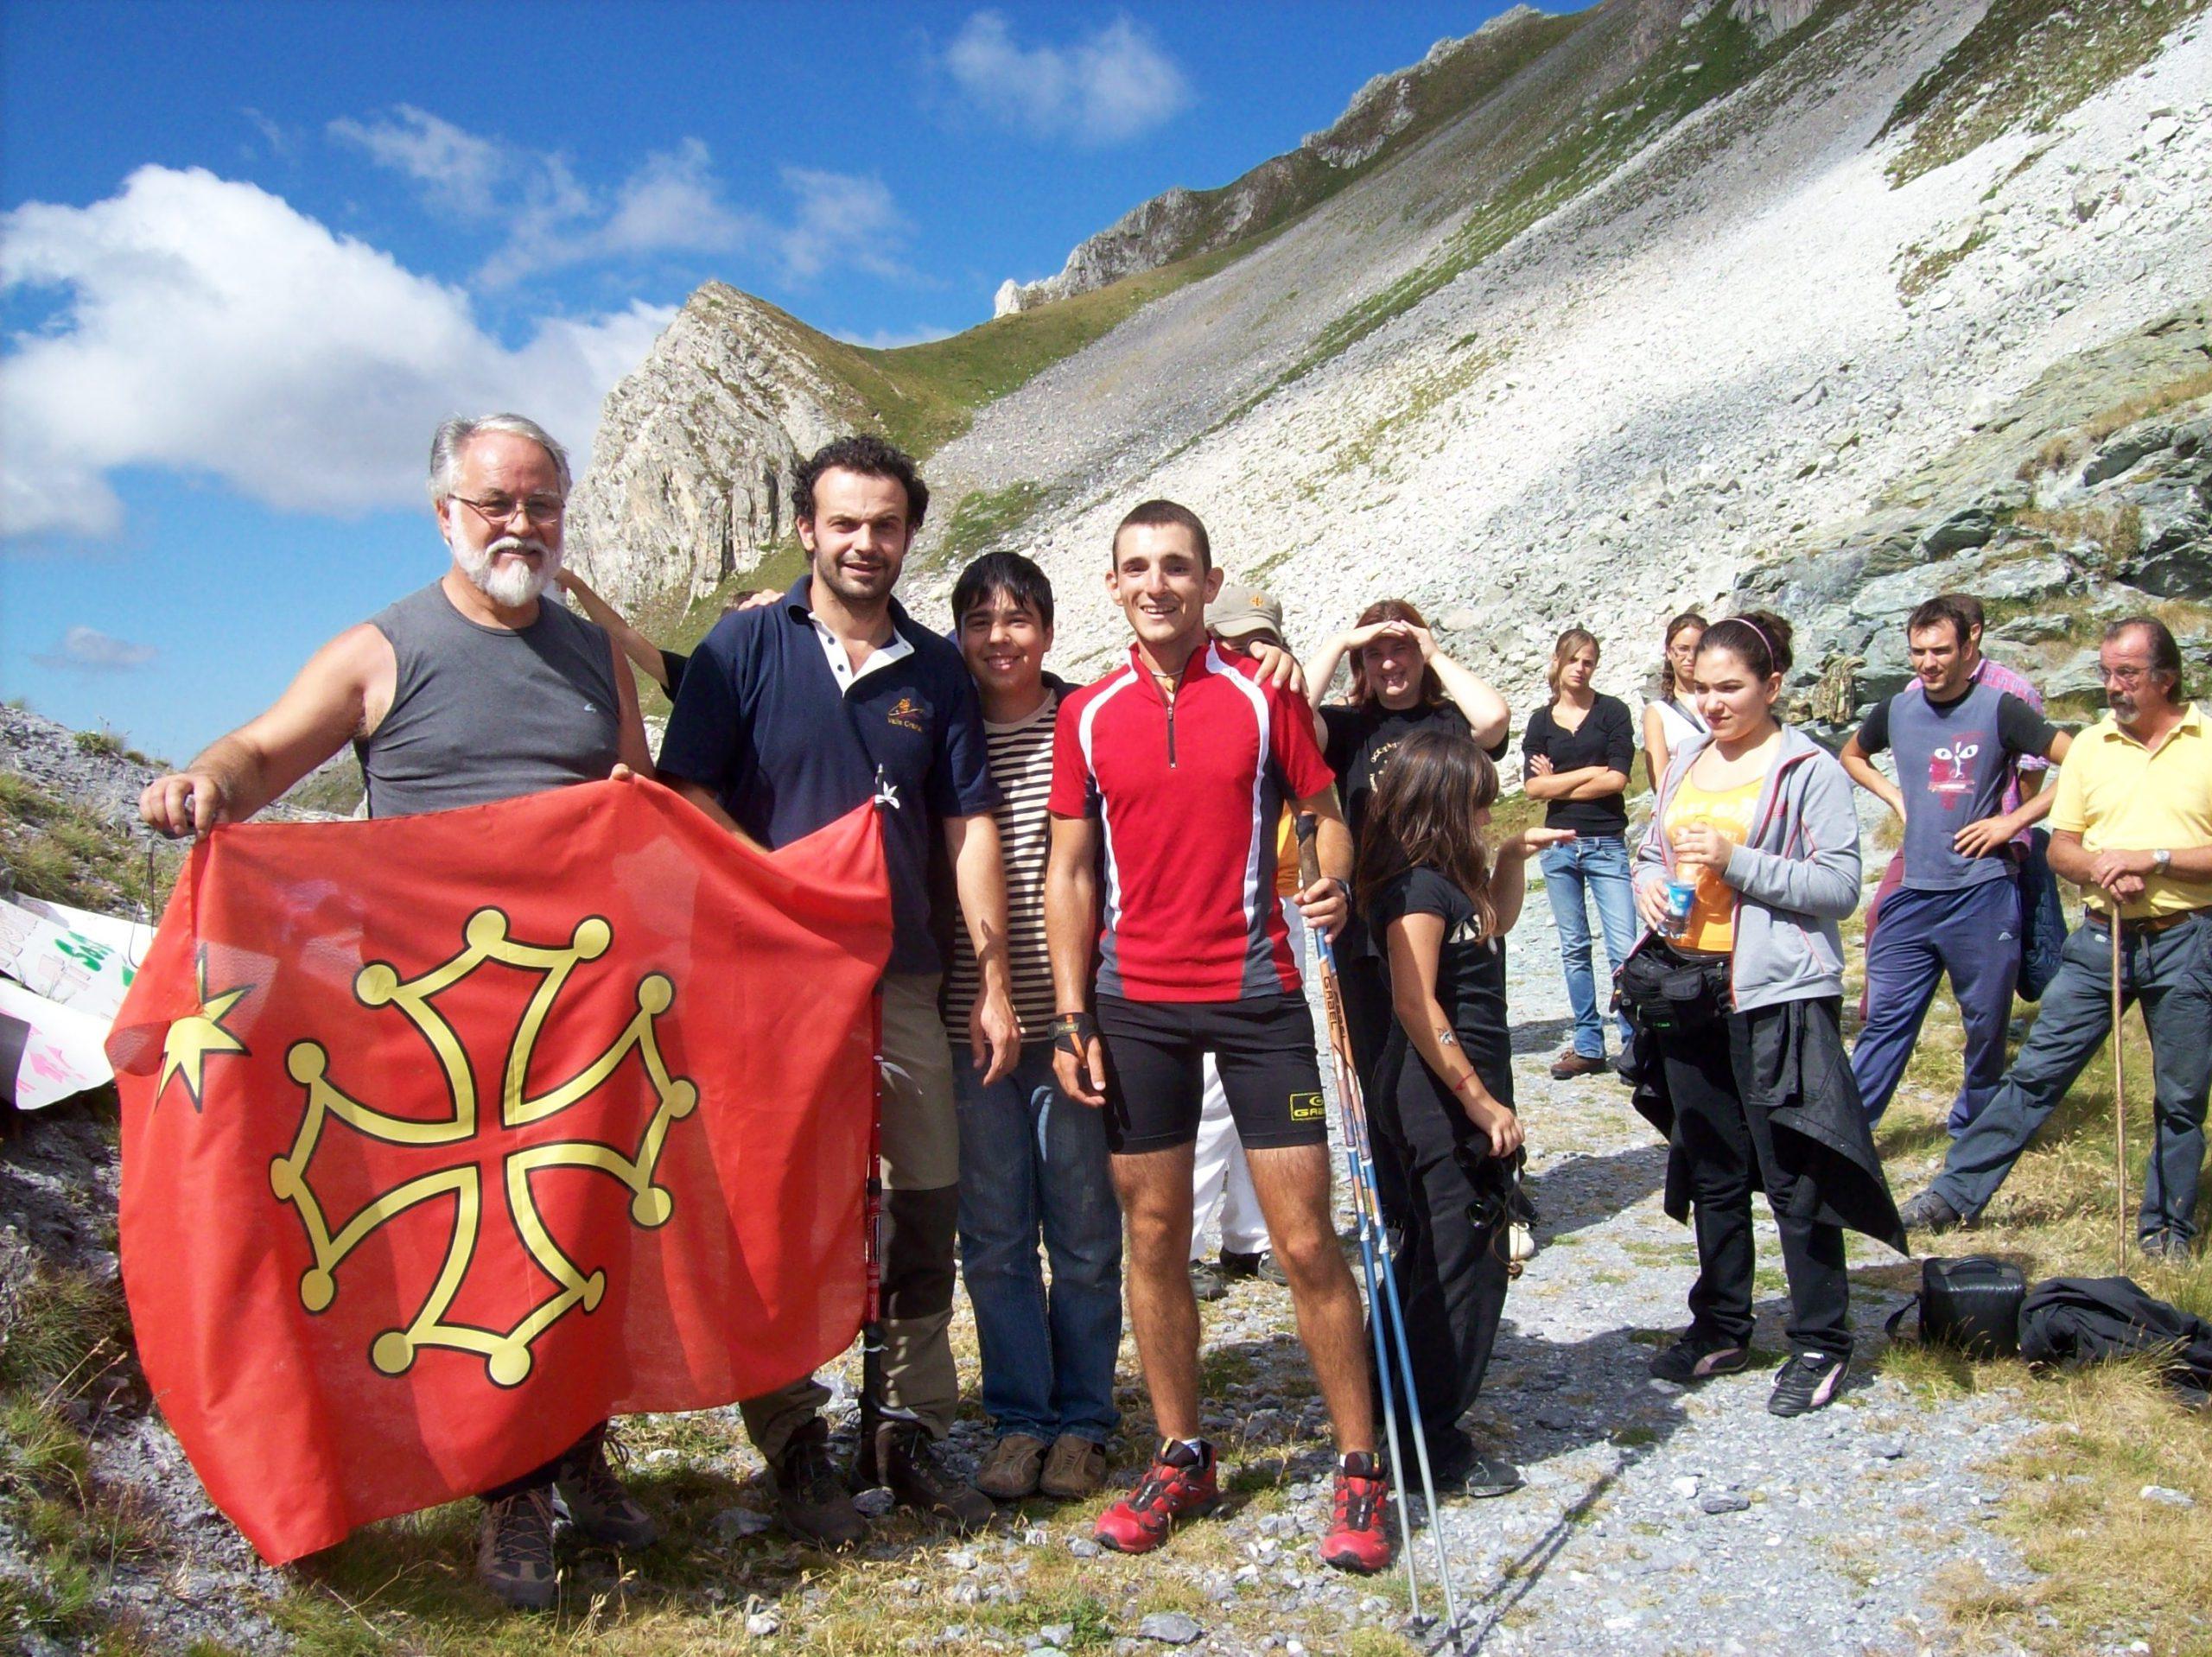 Traversata delle Alpi - Federico Bronzin